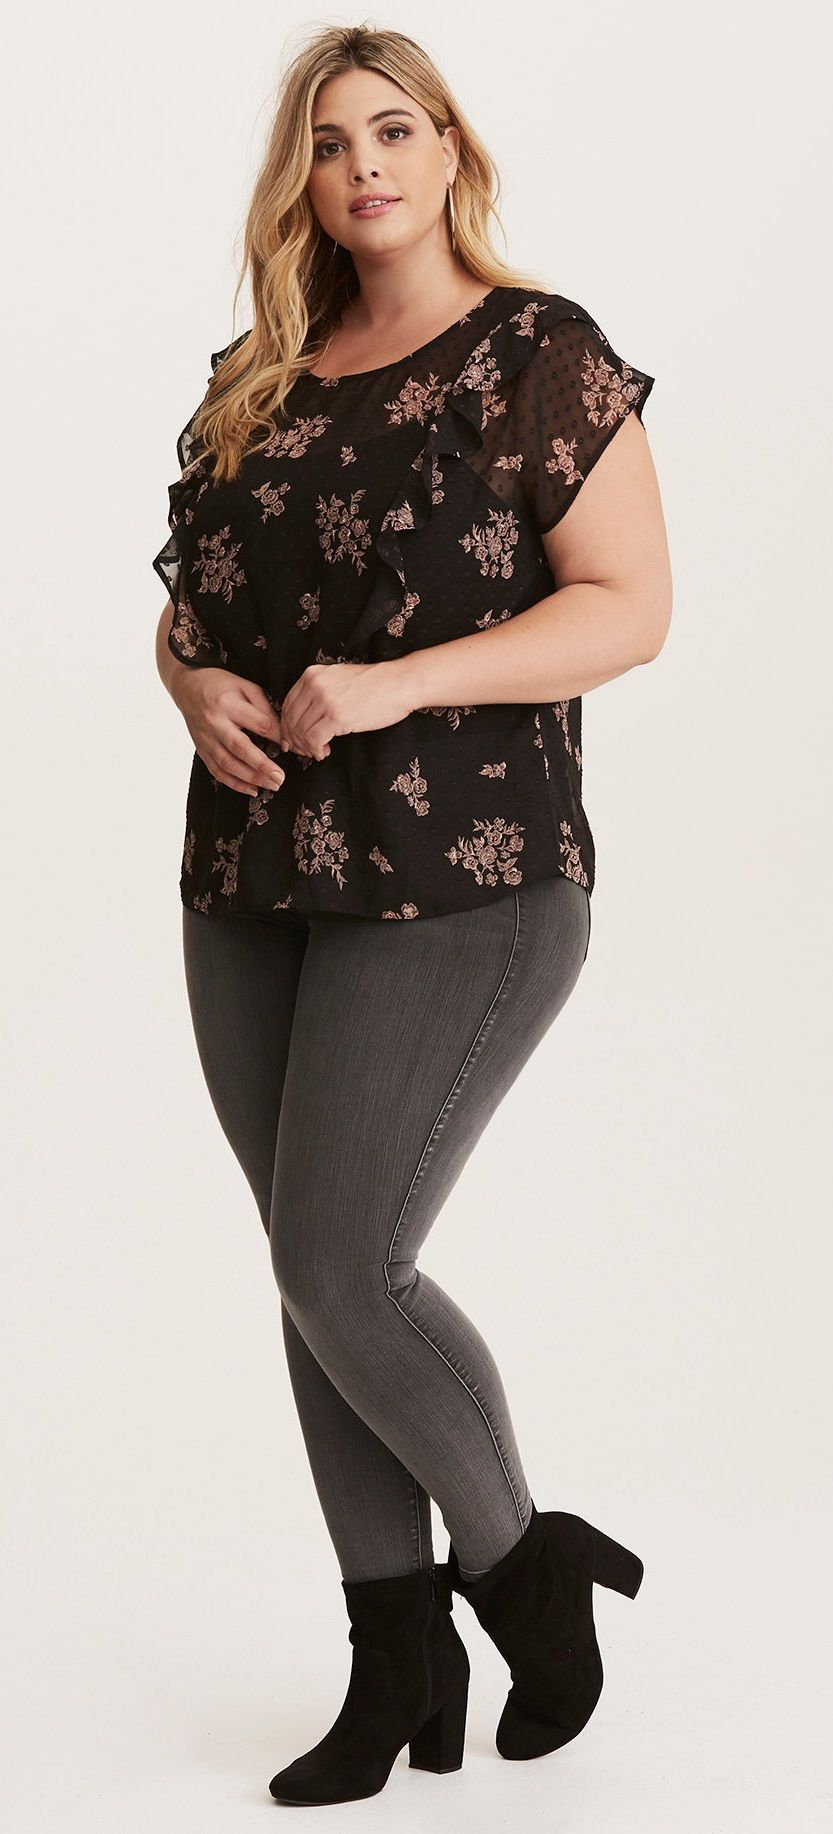 Plus Size Ruffled Blouse - Plus Size Fashion for Women